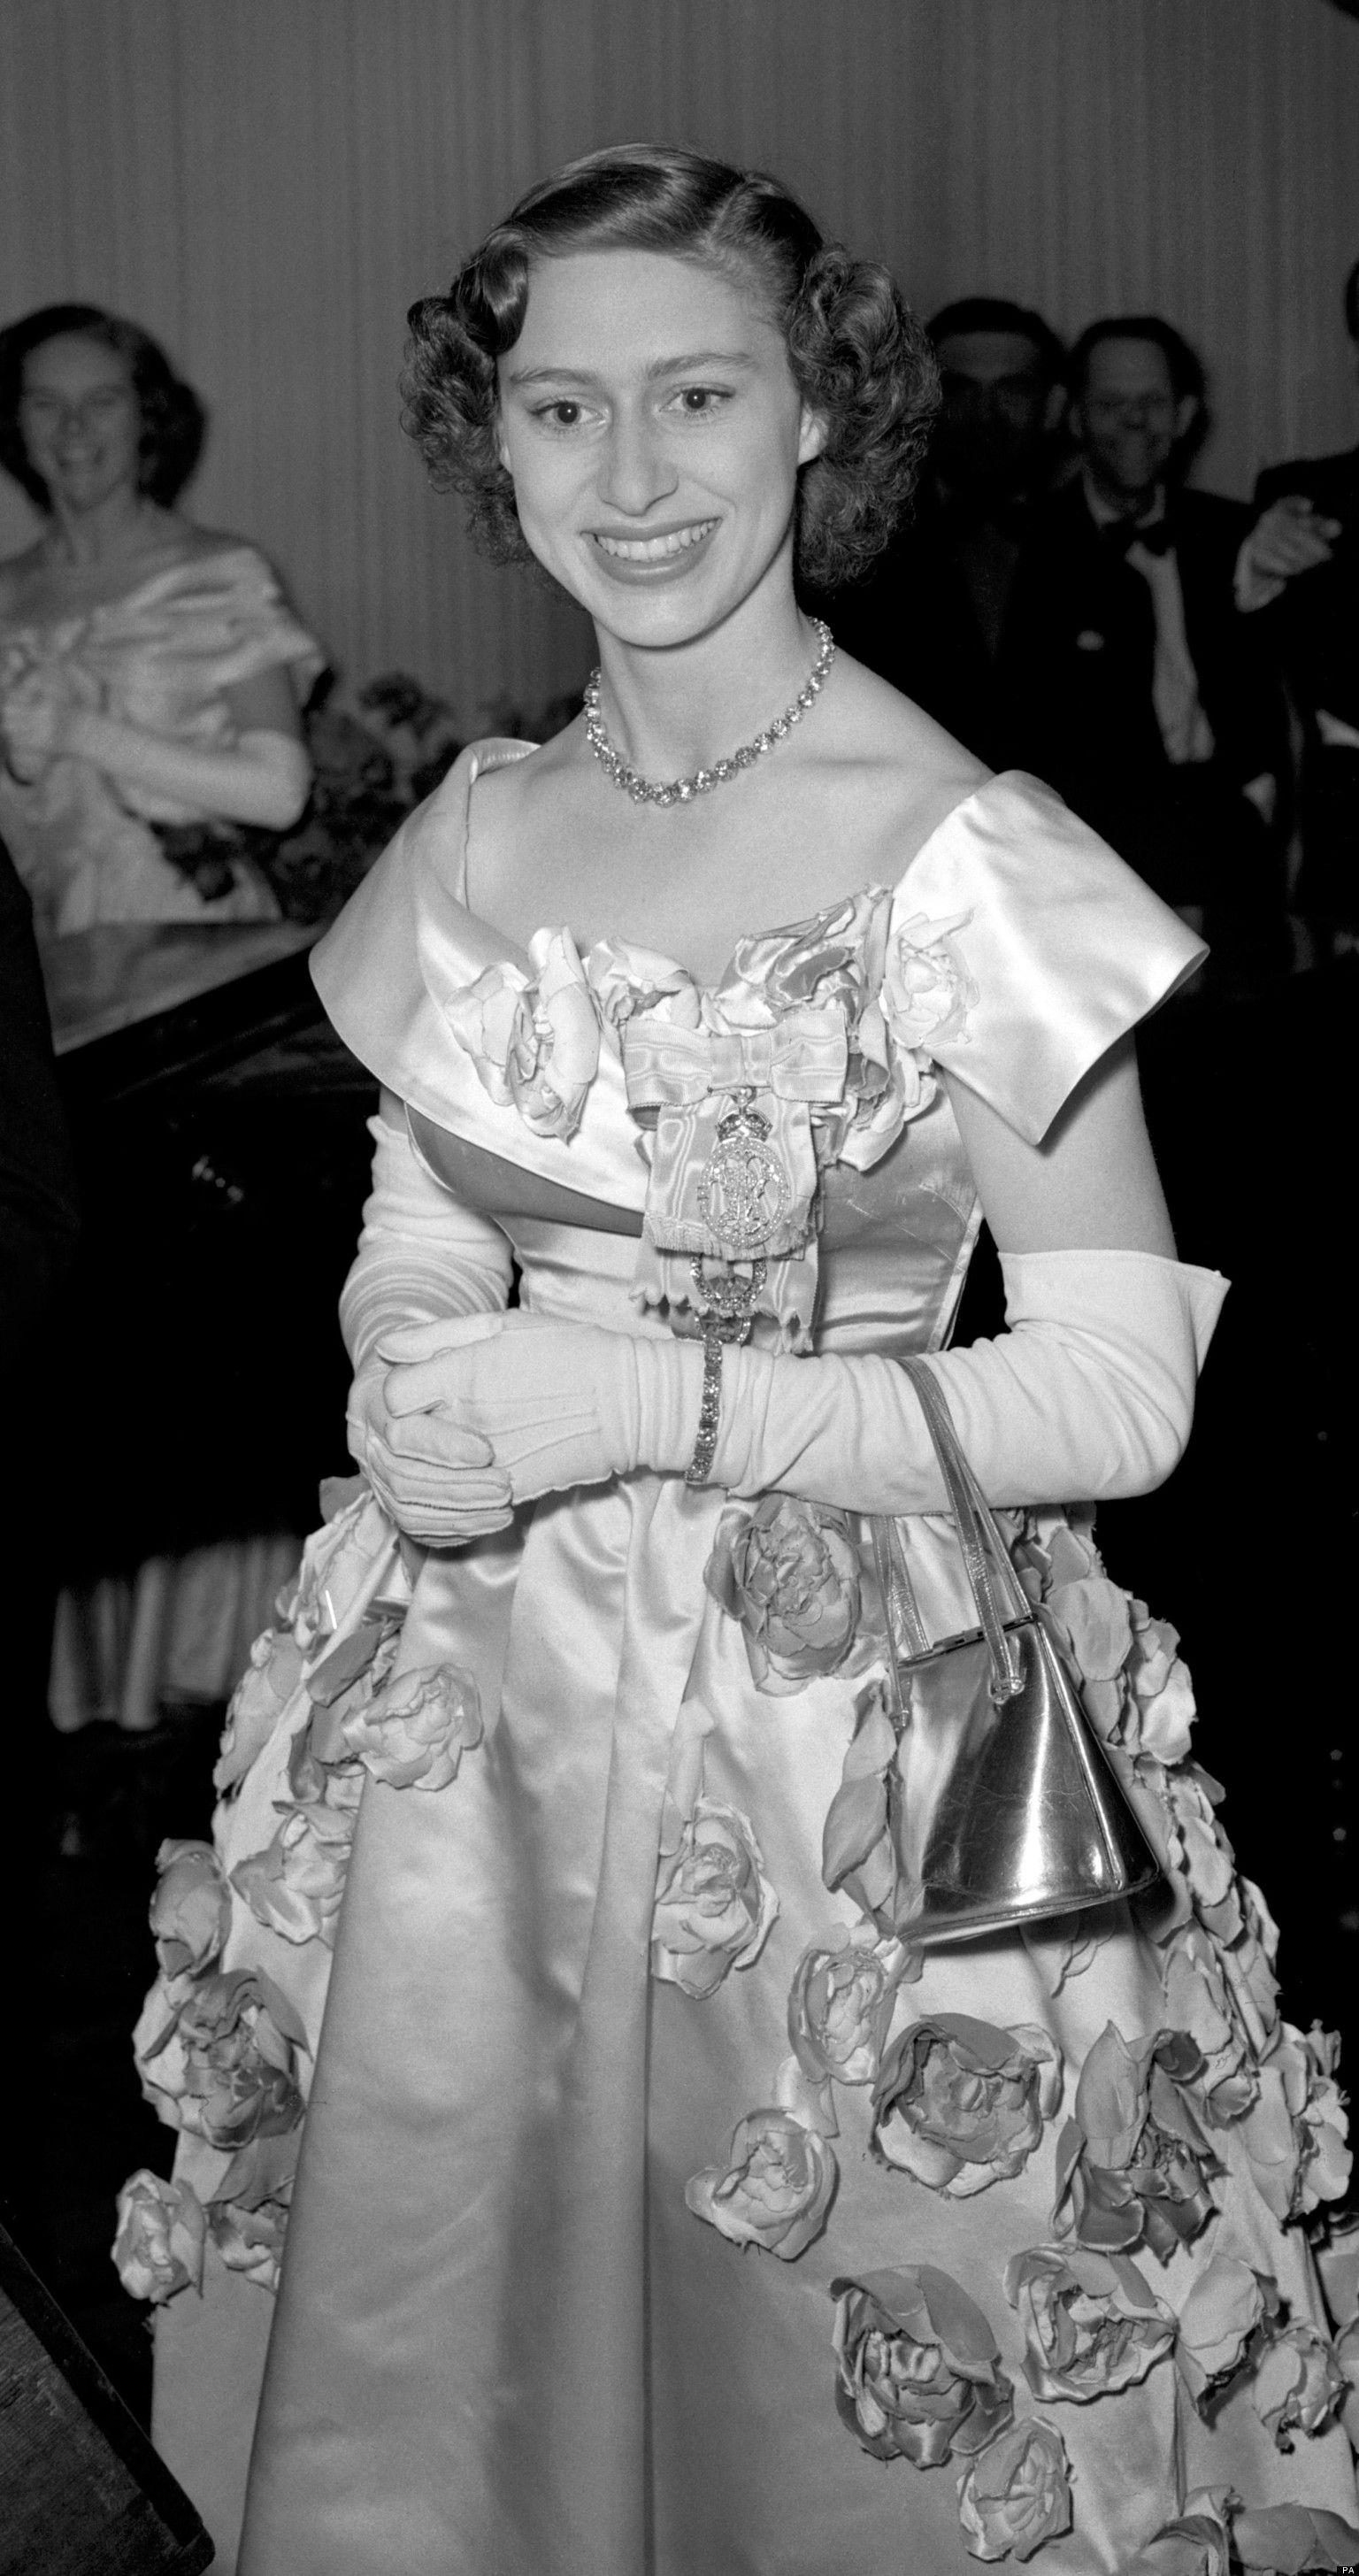 Princess Margaret Had 'Simple Tastes' In Food And Drink